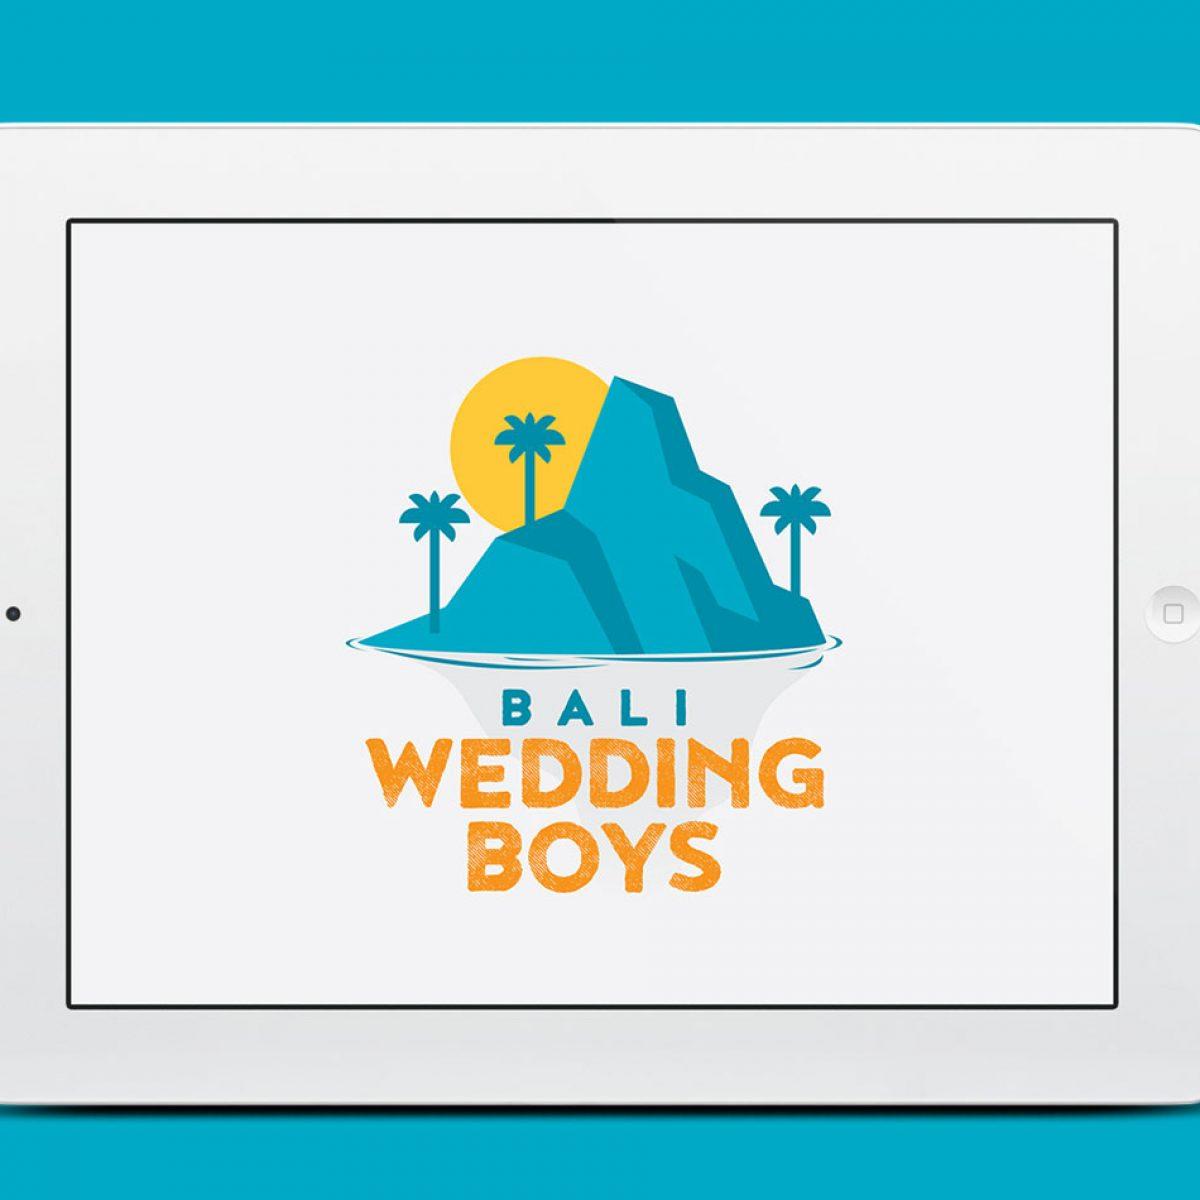 Bali Wedding Boys Logo Design